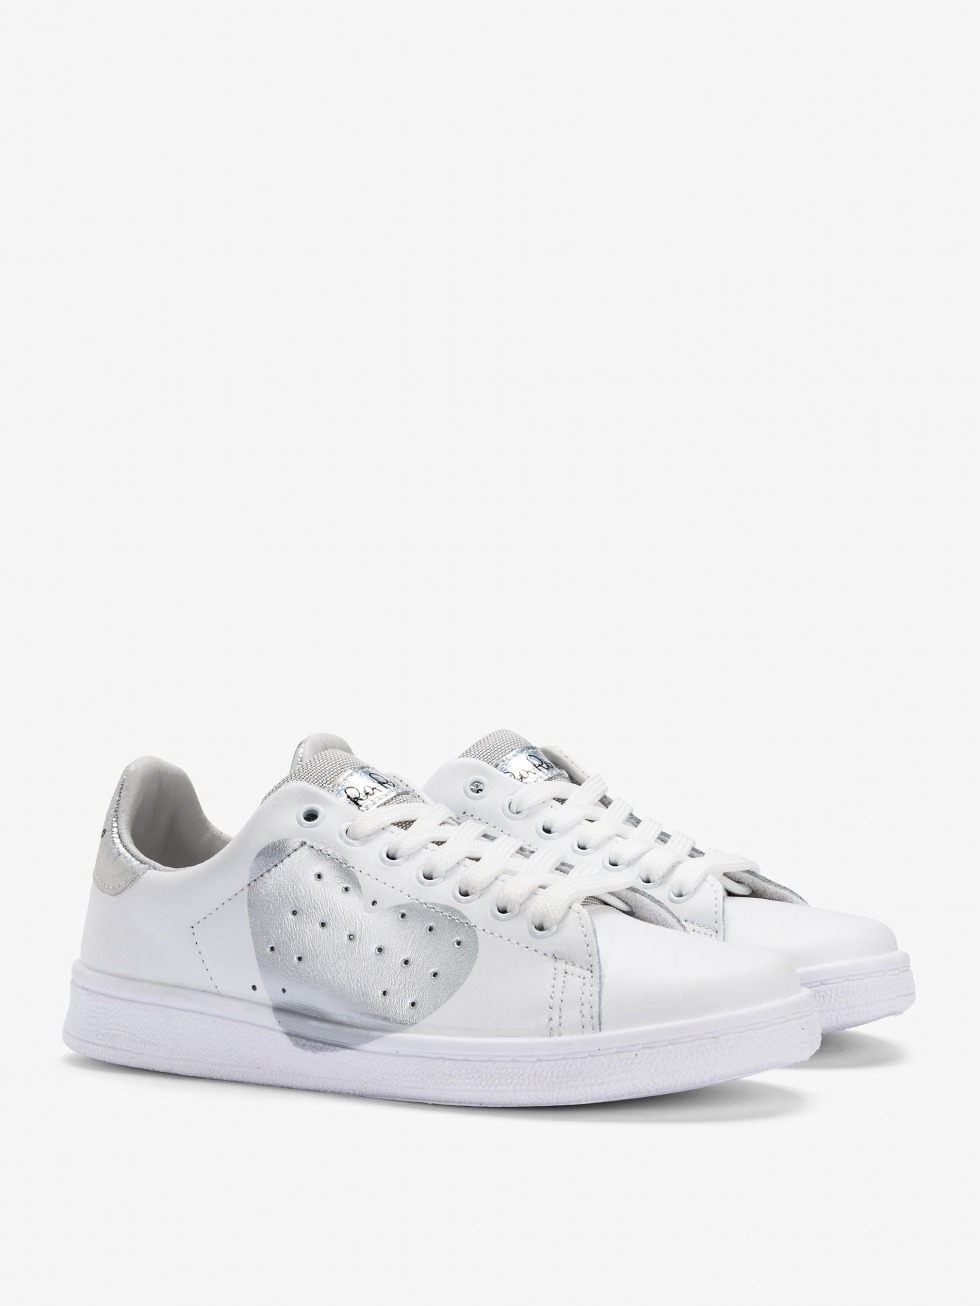 Daiquiri Sneakers - Space Silver Heart